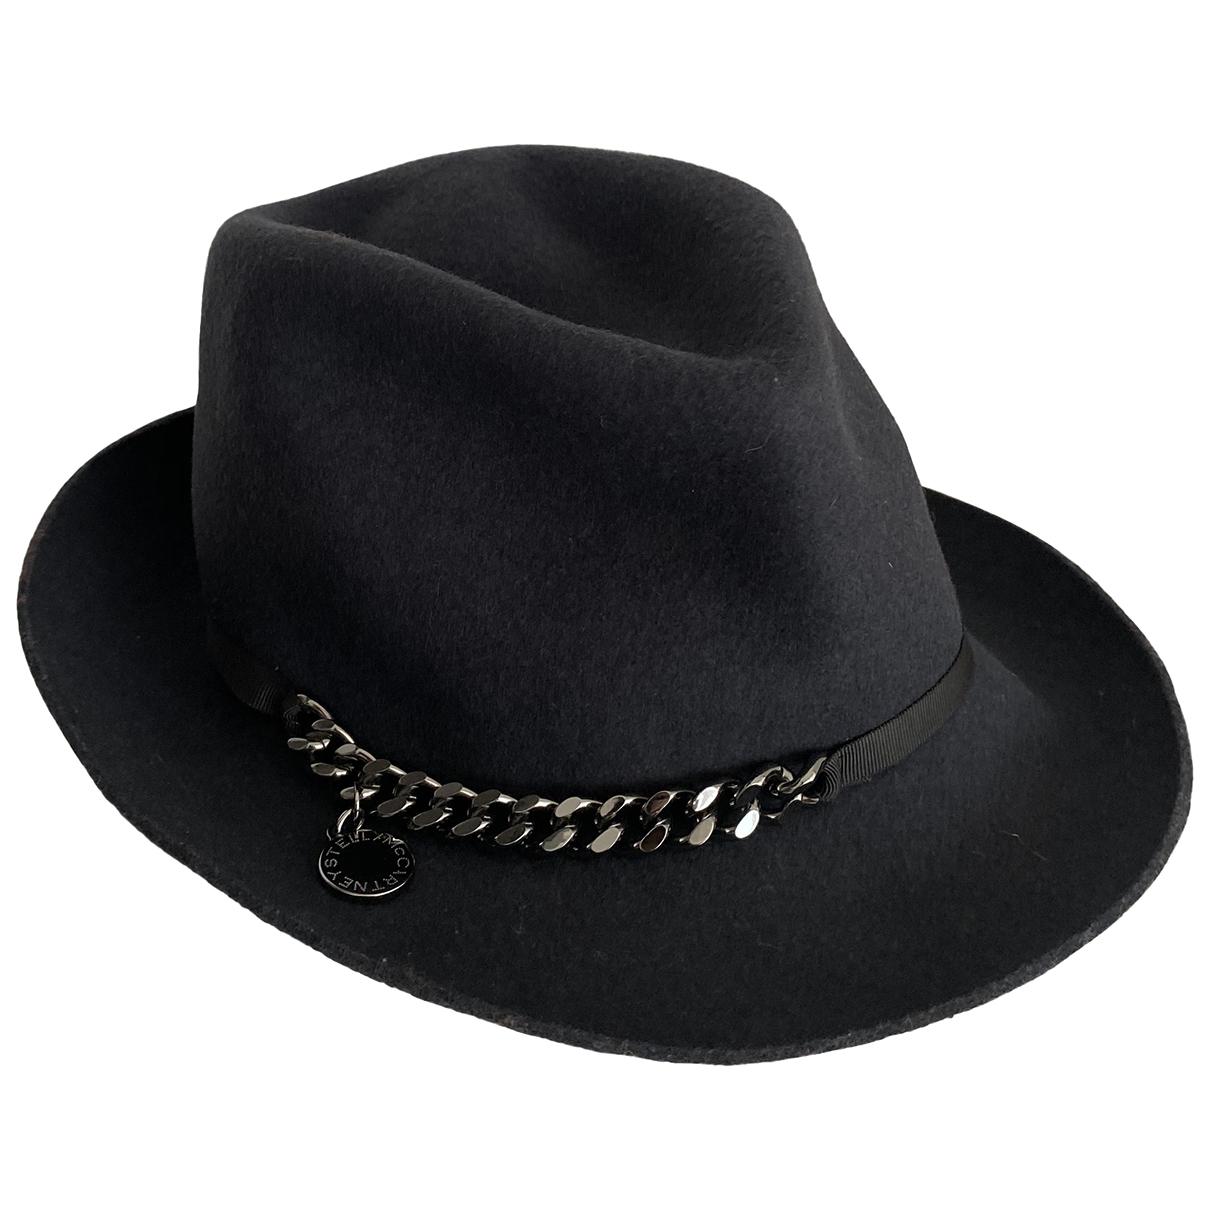 Sombrero de Lana Stella Mccartney